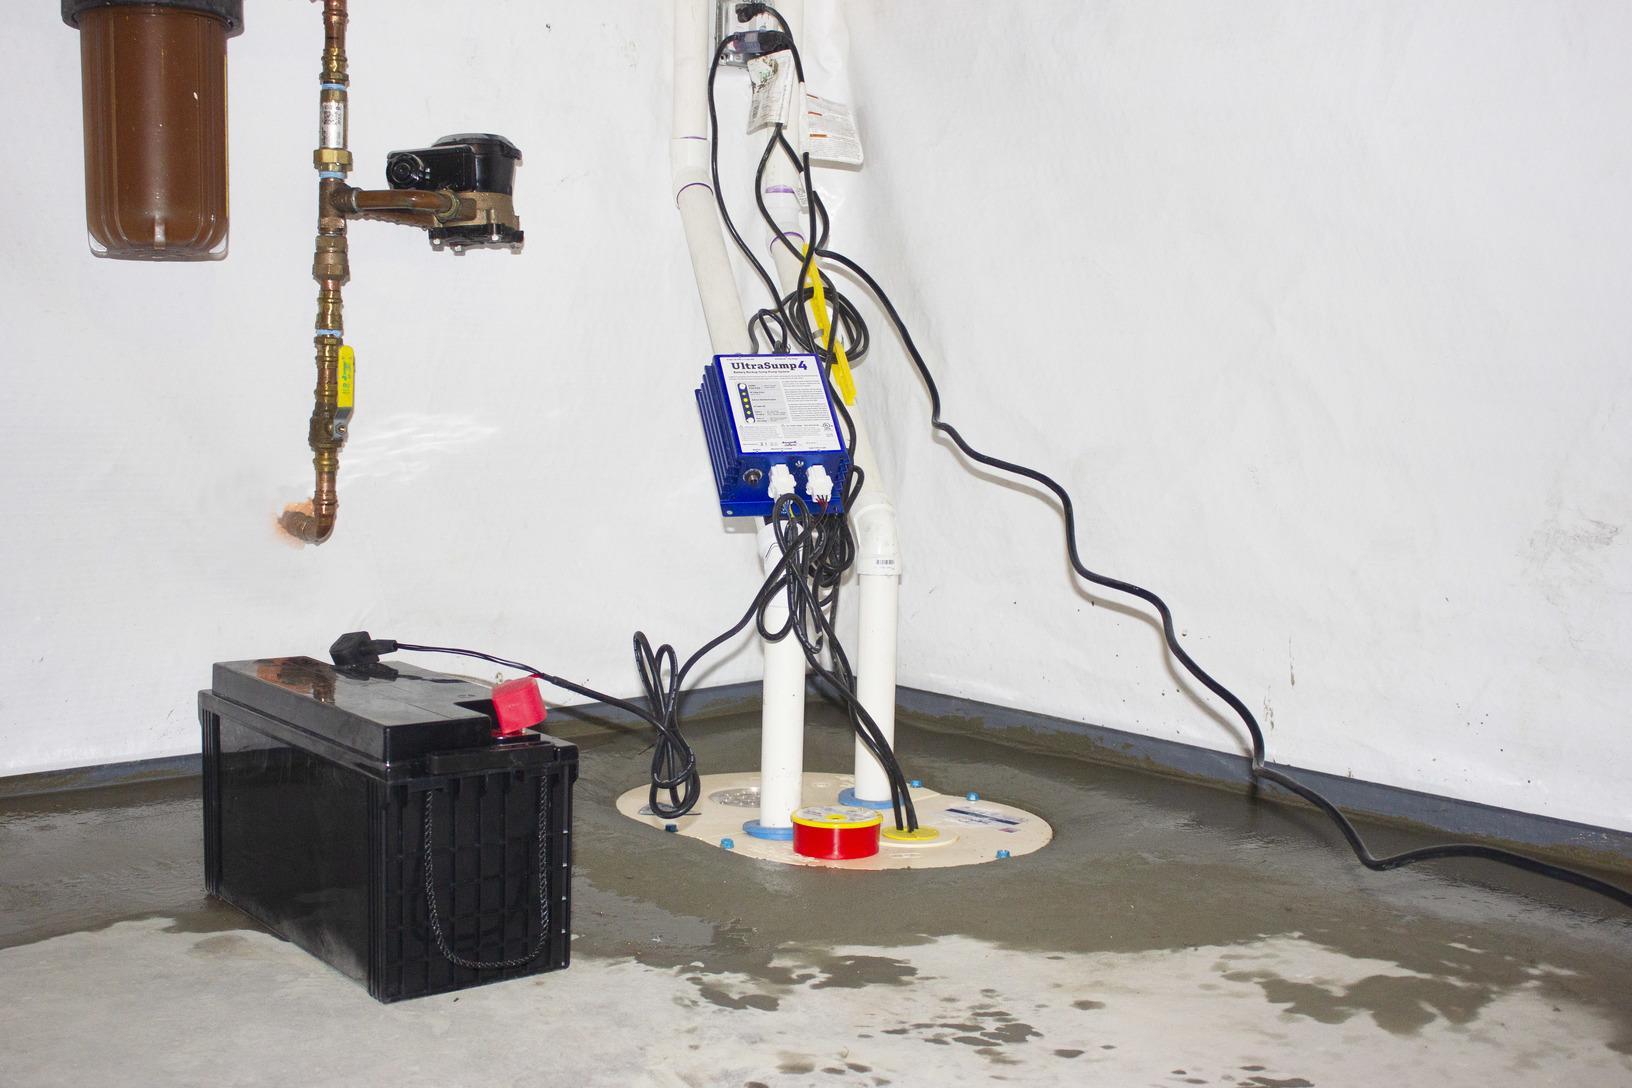 Basement Waterproofing in Weare, New Hampshire, by Matt Clark's Northern Basement Systems.